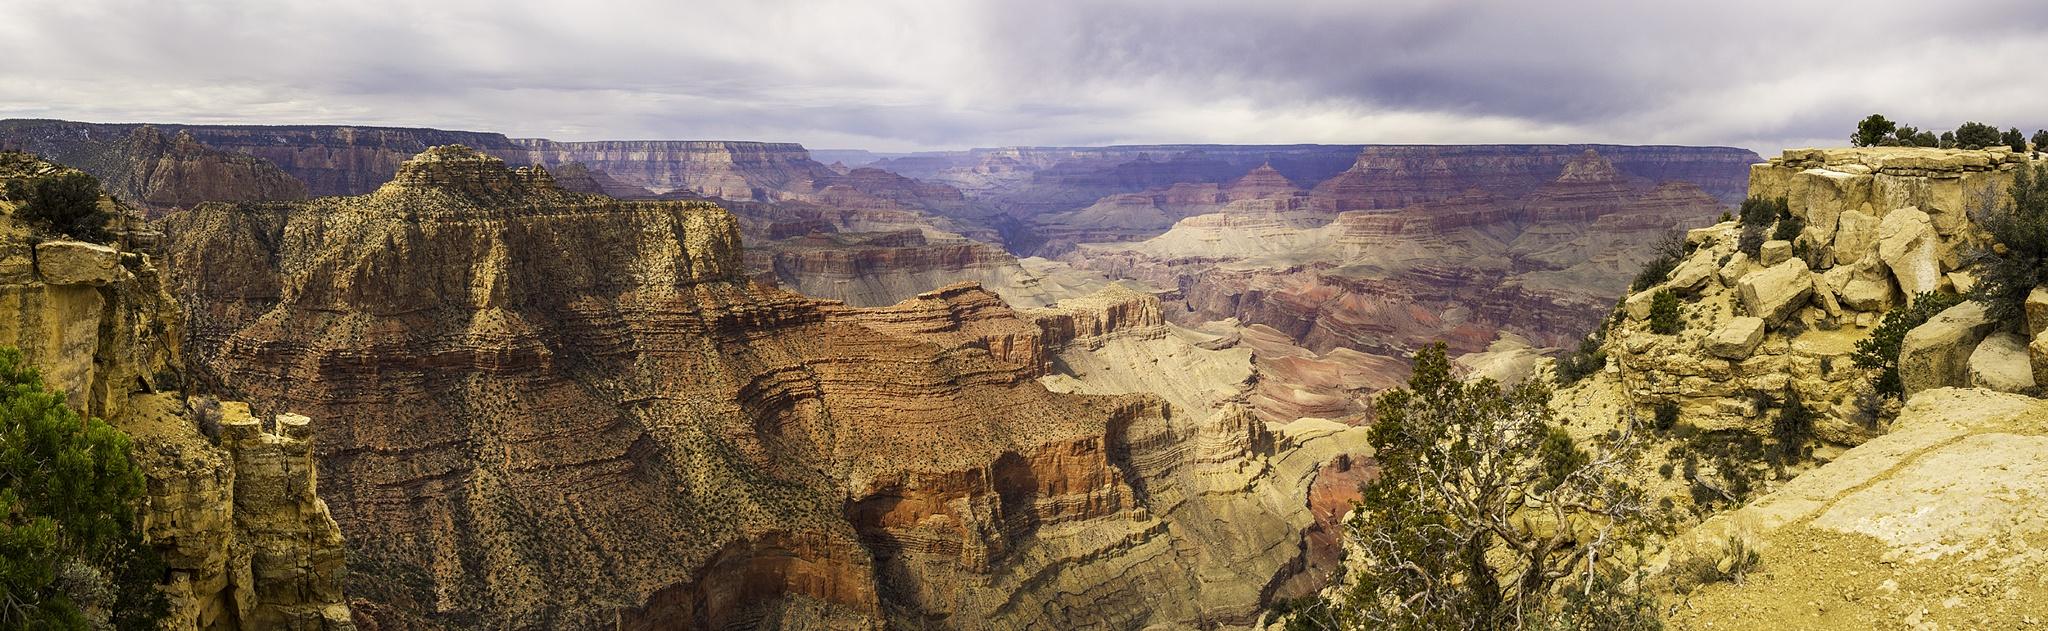 The Grand Canyon Arizona by Jaime O. Frias